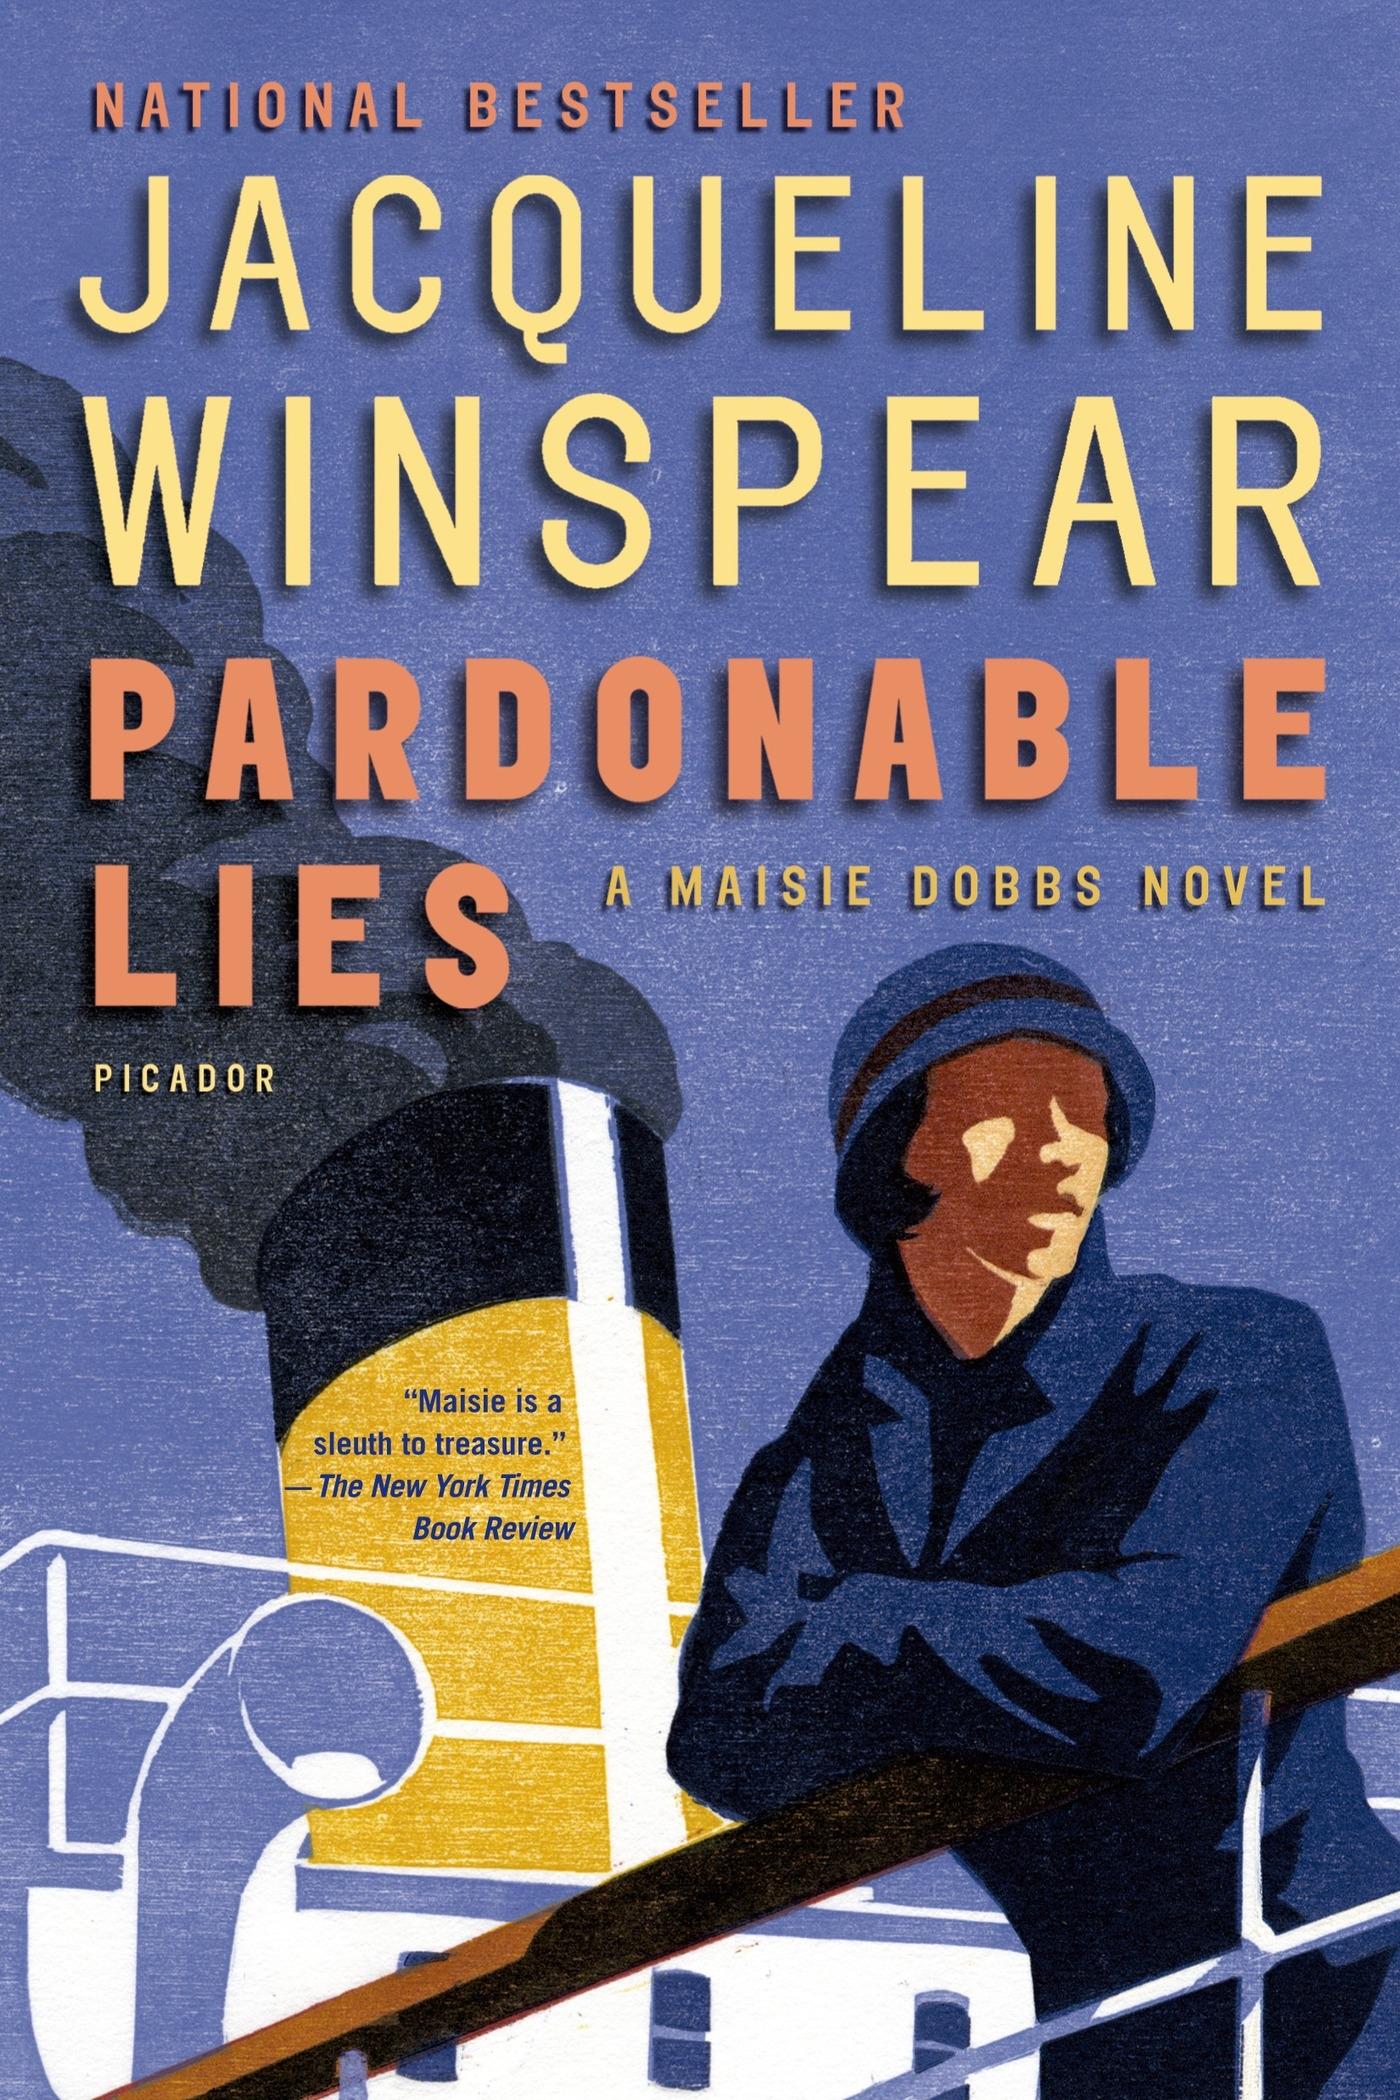 Pardonable lies : a Maisie Dobbs novel